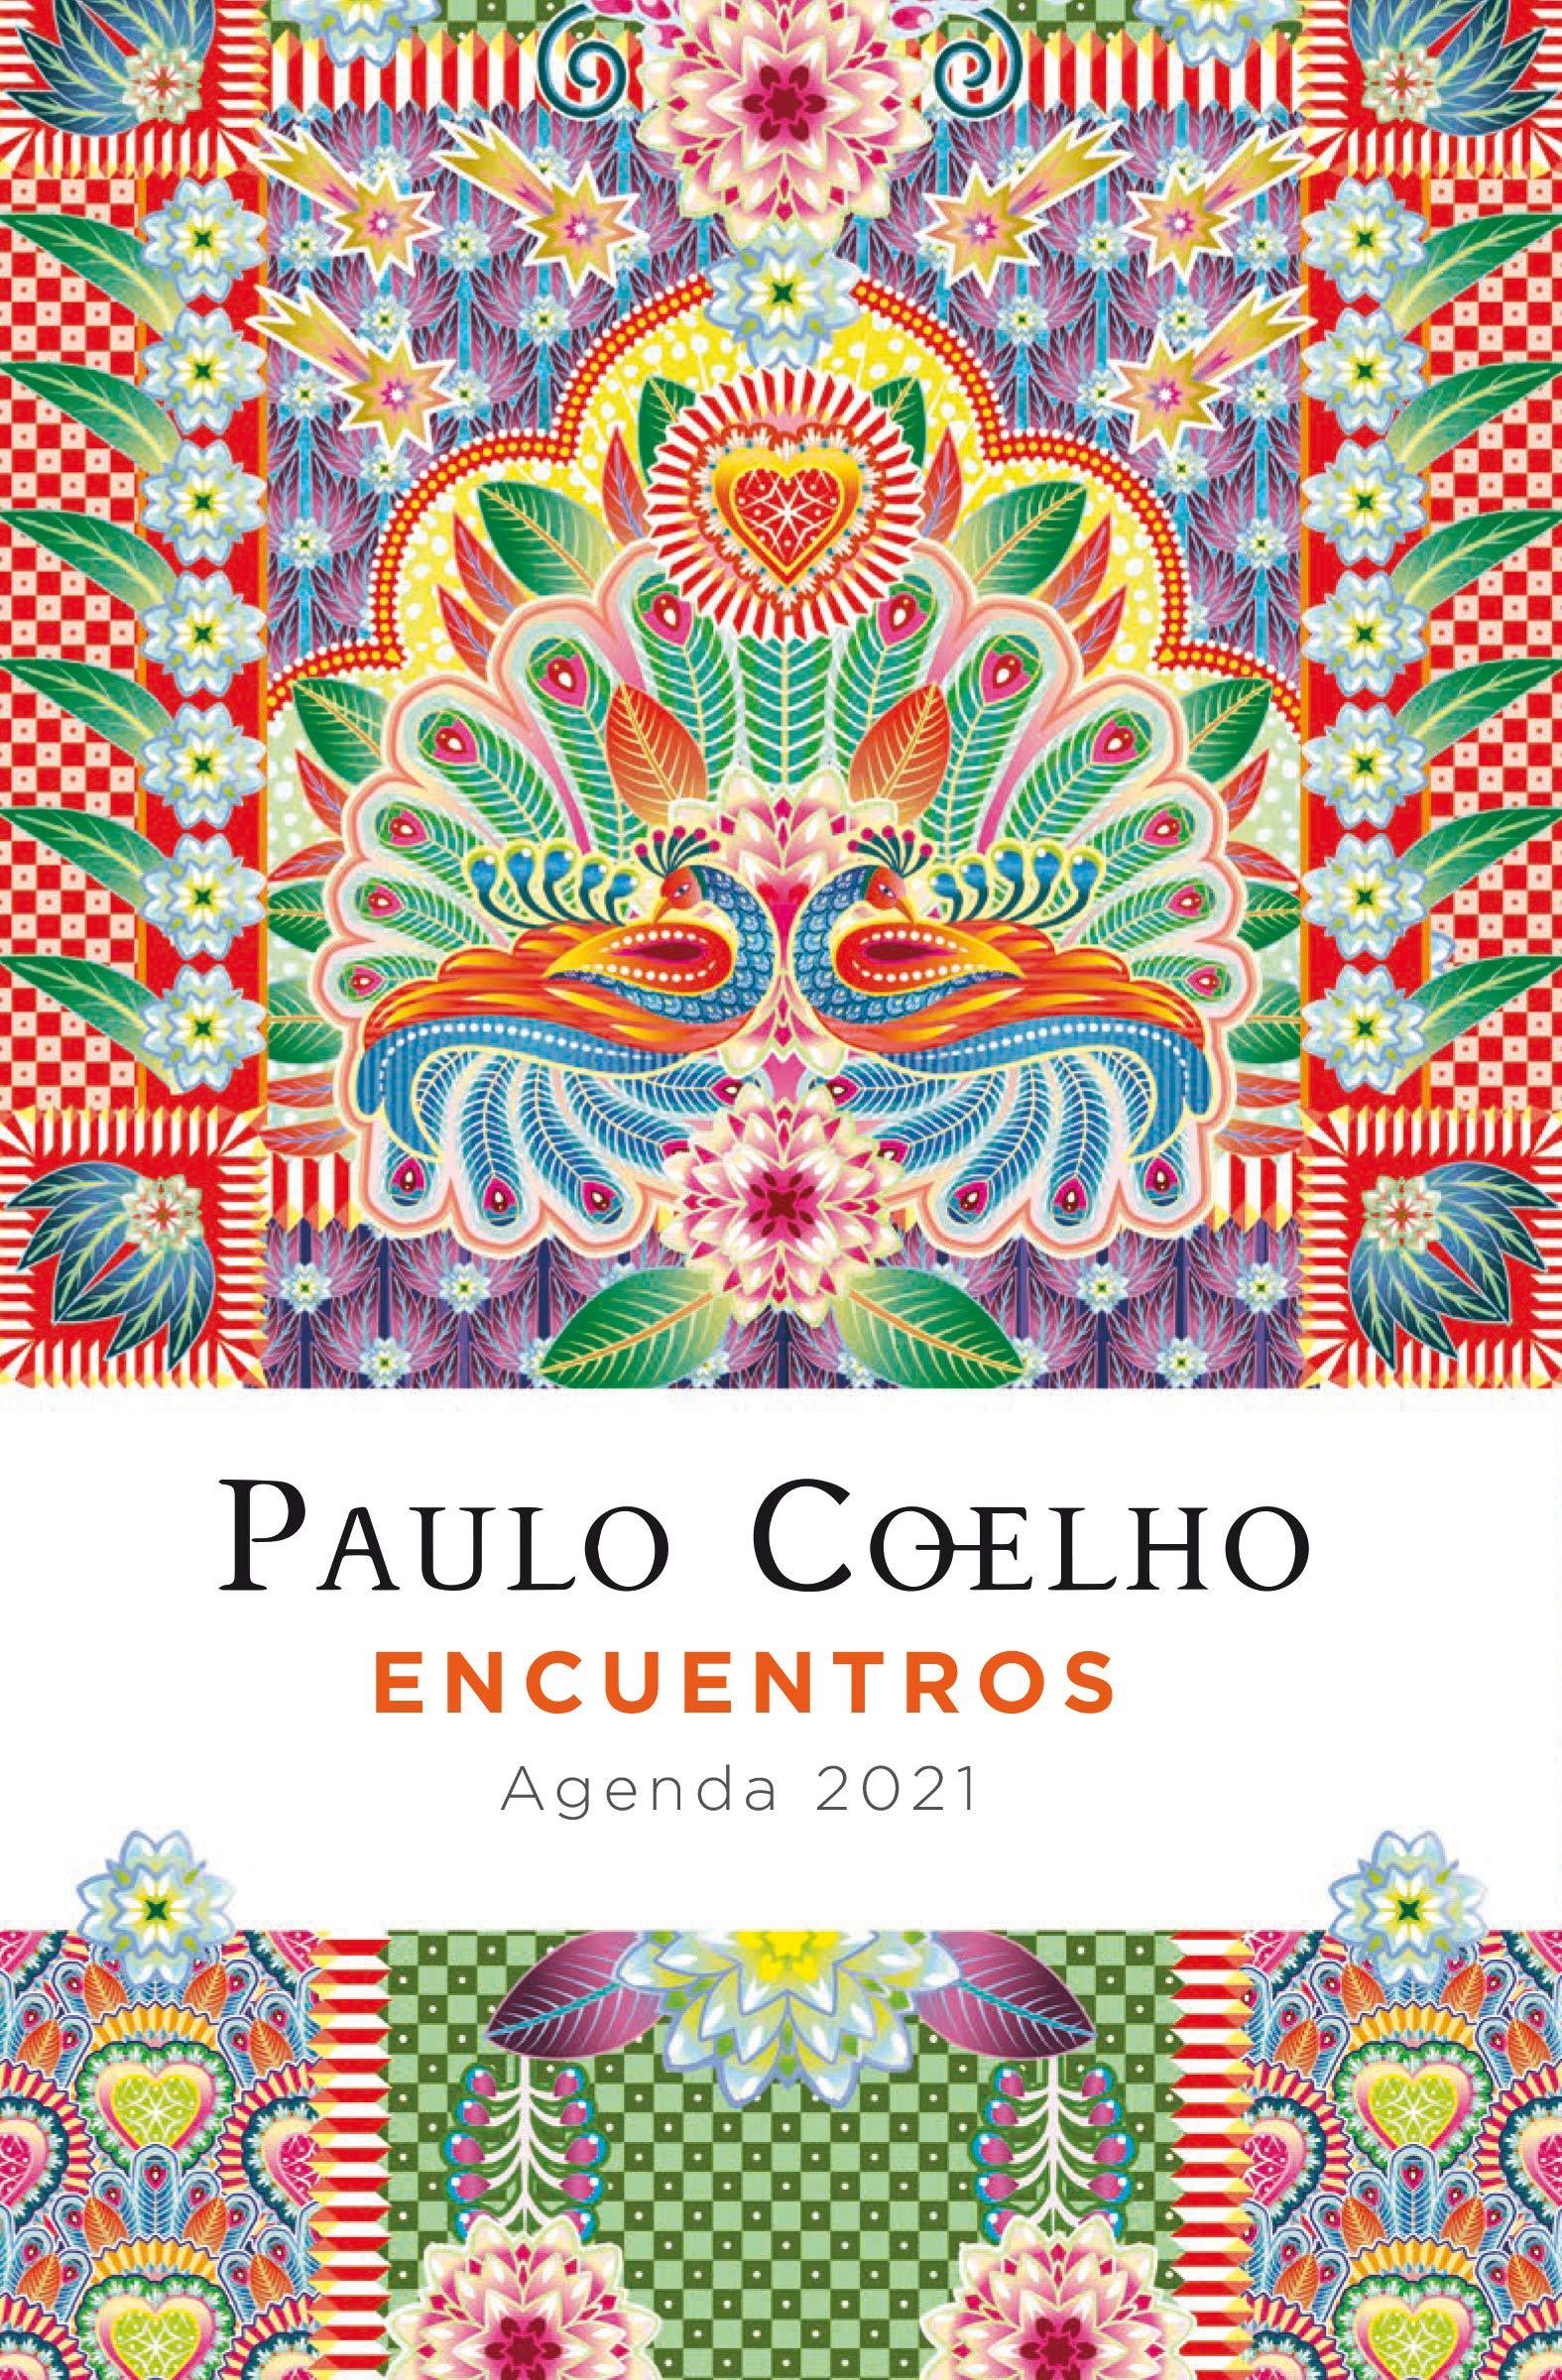 Encuentros Agenda 2021 Spanish Edition Coelho Paulo 9780593310724 Amazon Com Books